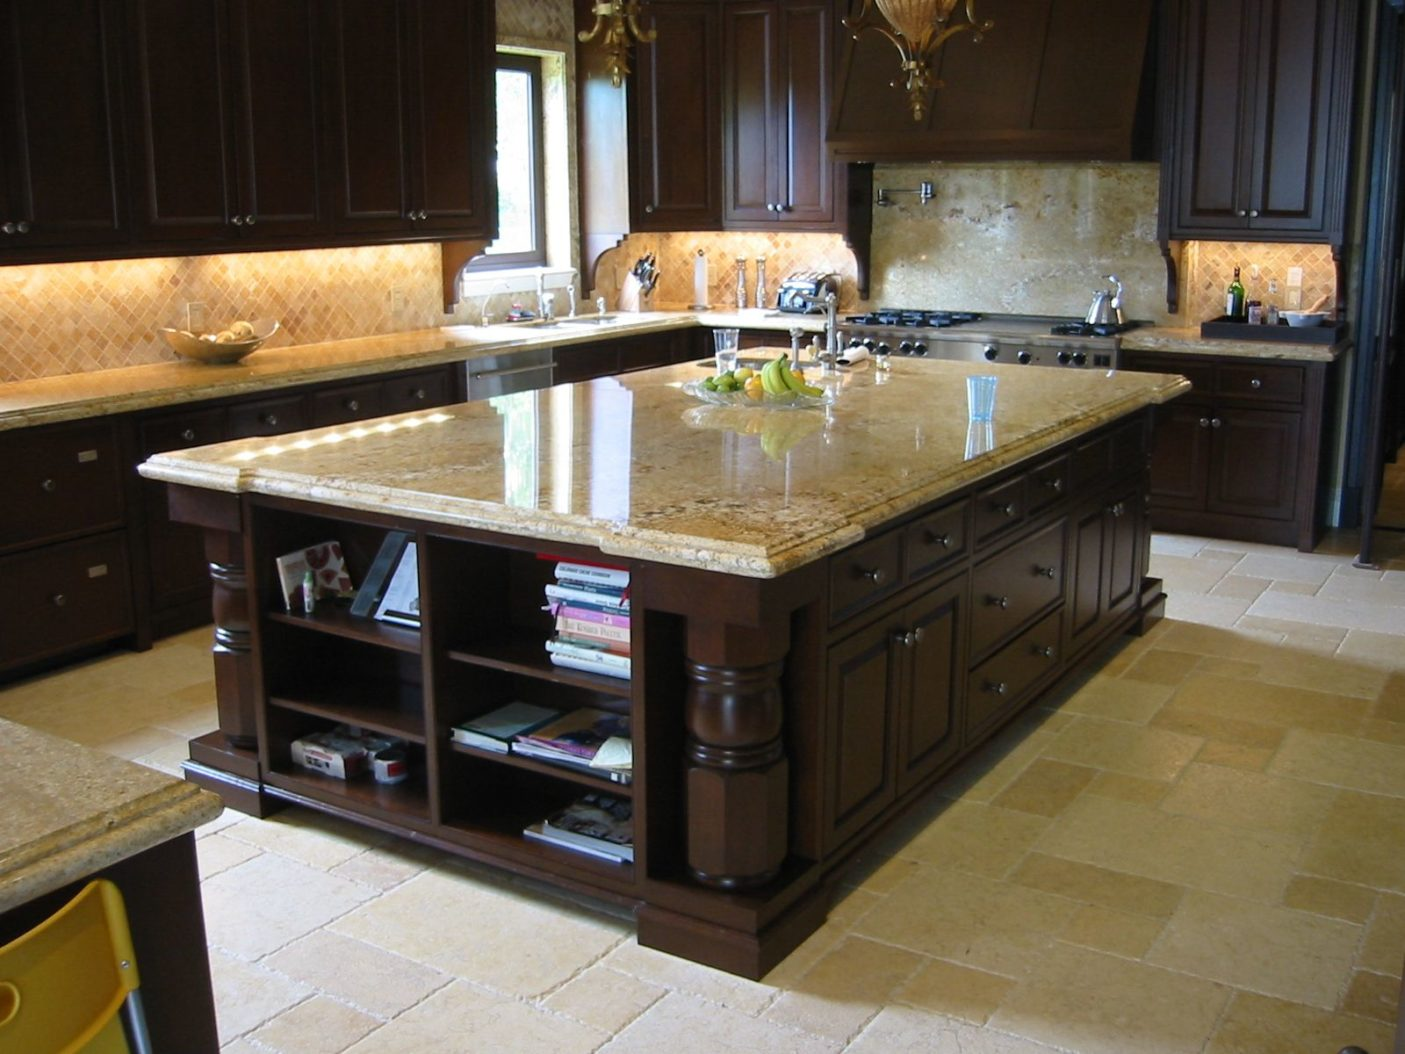 Kitchens-16.jpg